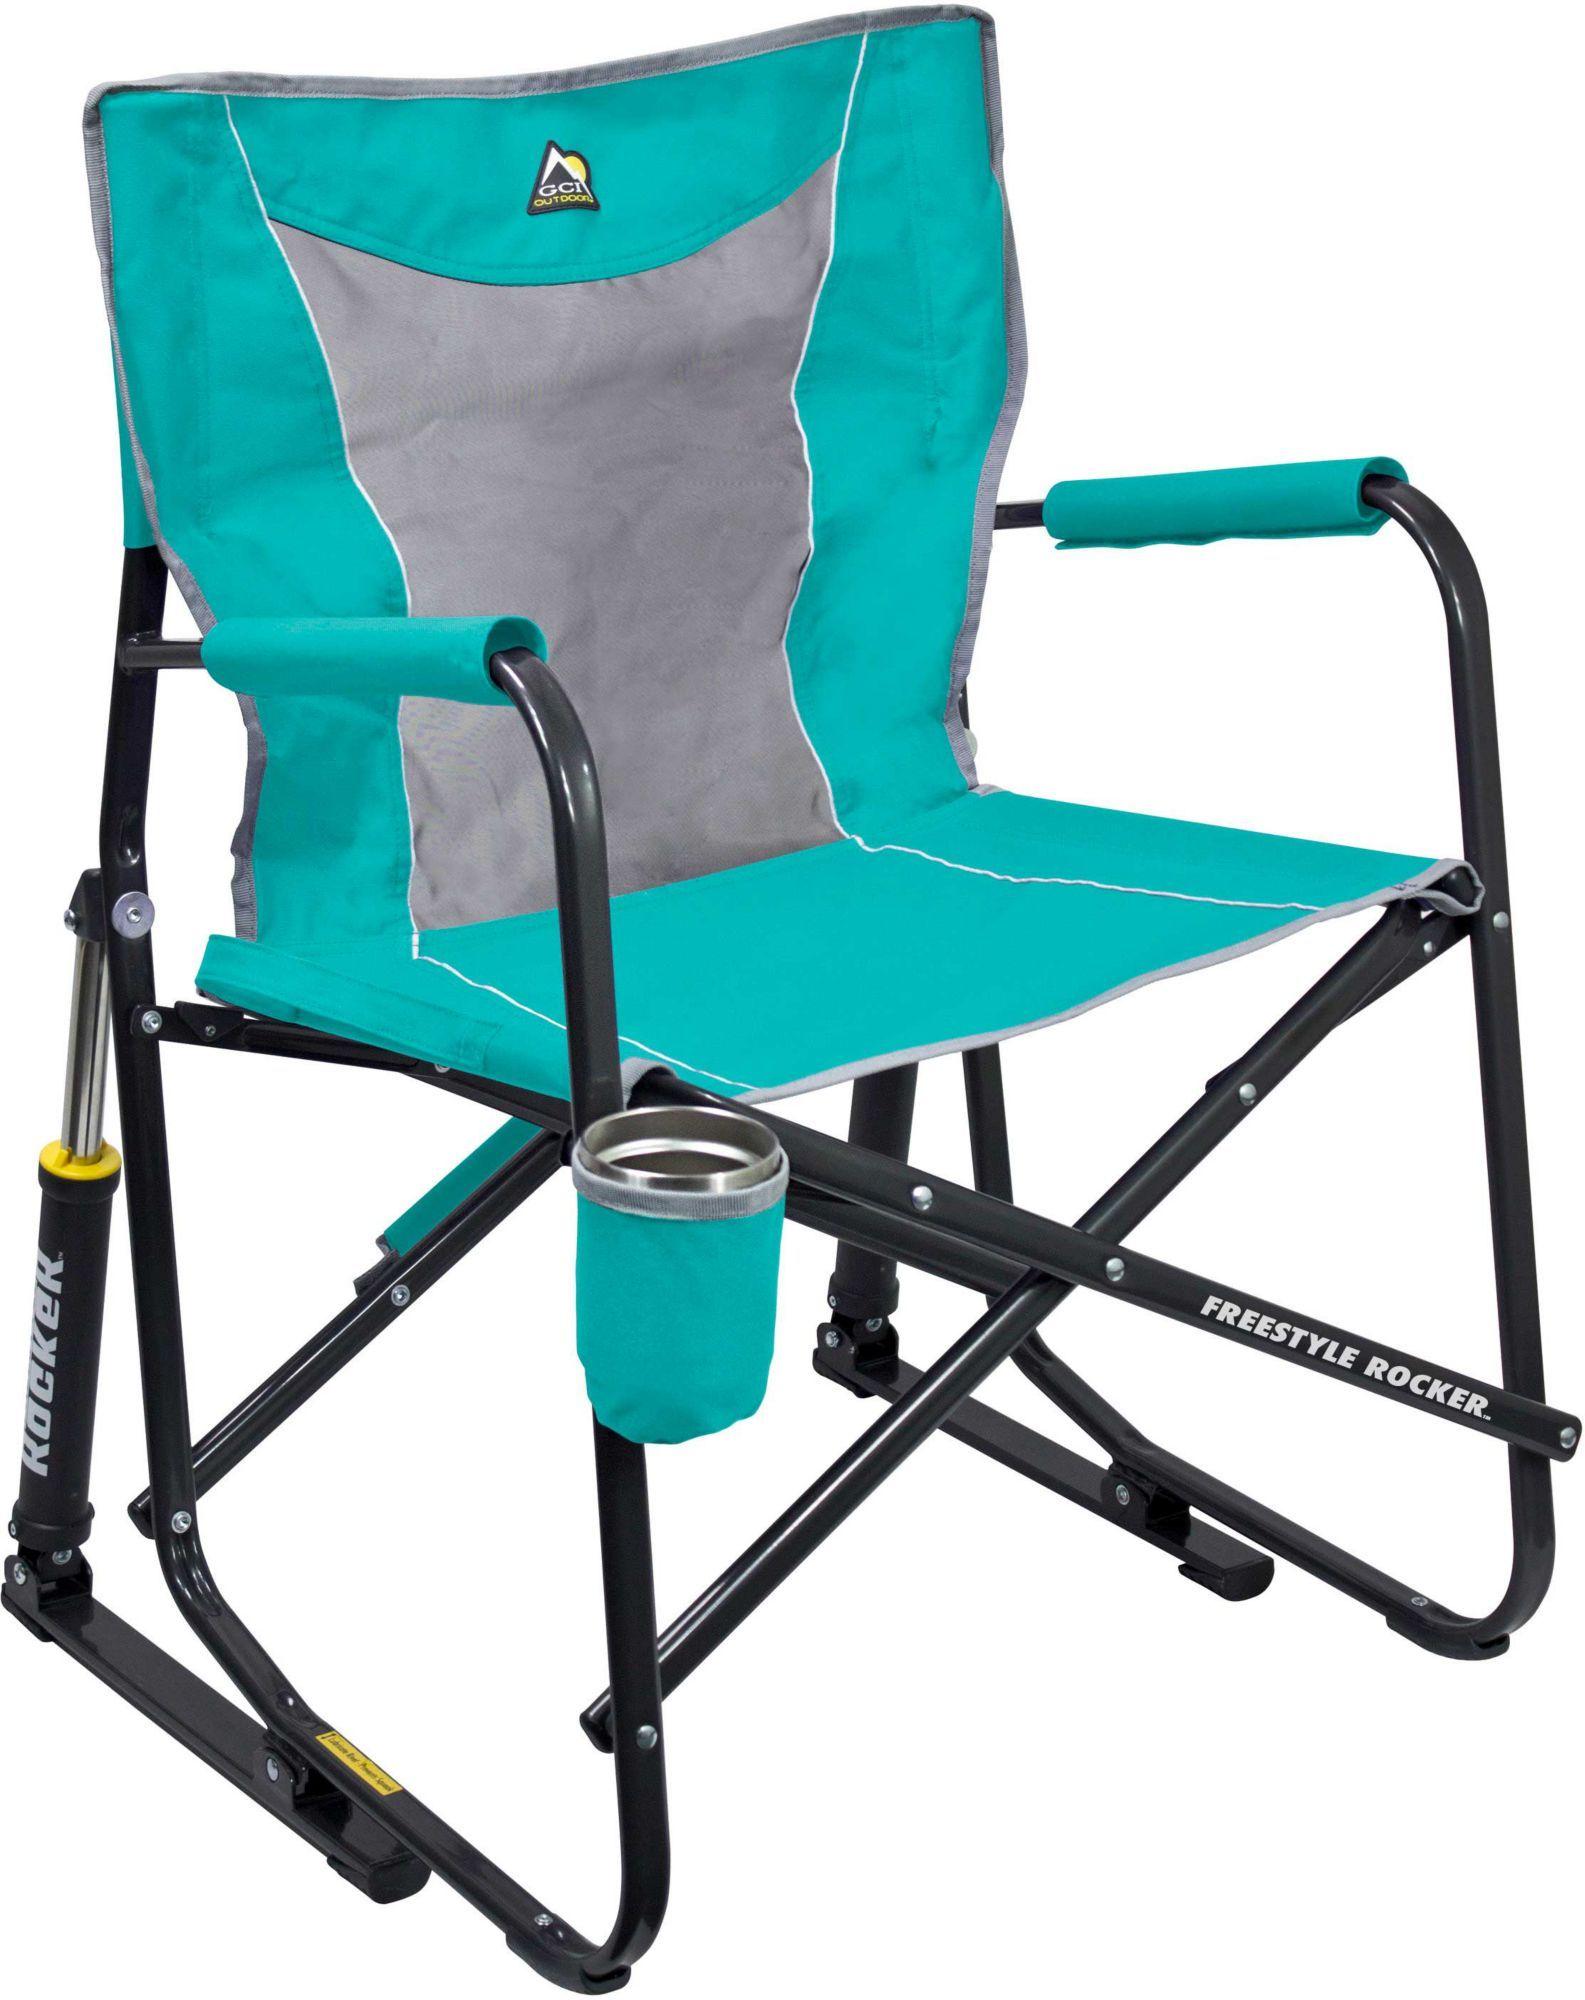 Prime Gci Outdoor Freestyle Rocker Mesh Chair Green Mesh Chair Lamtechconsult Wood Chair Design Ideas Lamtechconsultcom